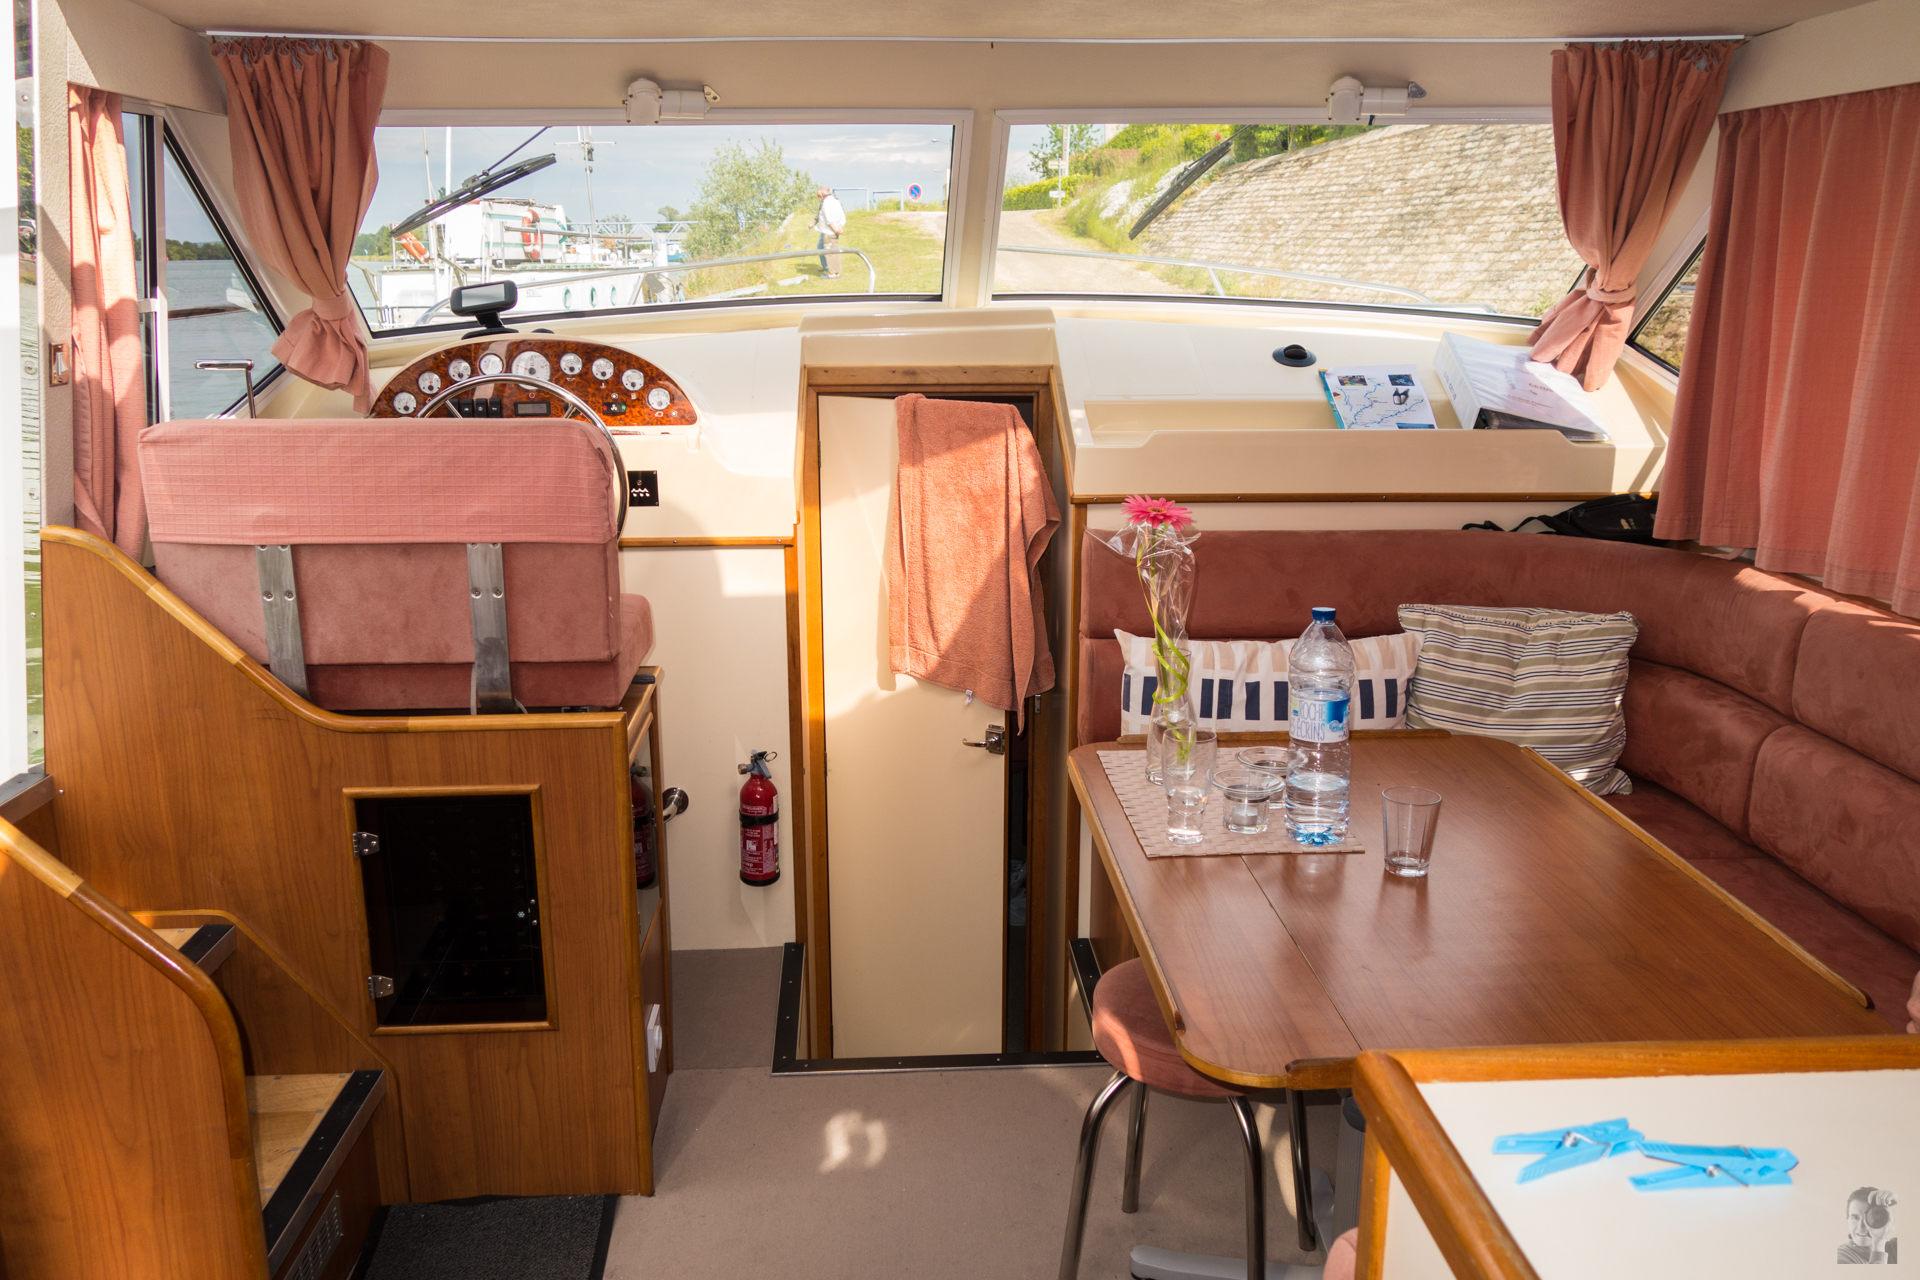 Hausbootferien 2014-Scey-sur-Saône, Locaboat, Europa 400